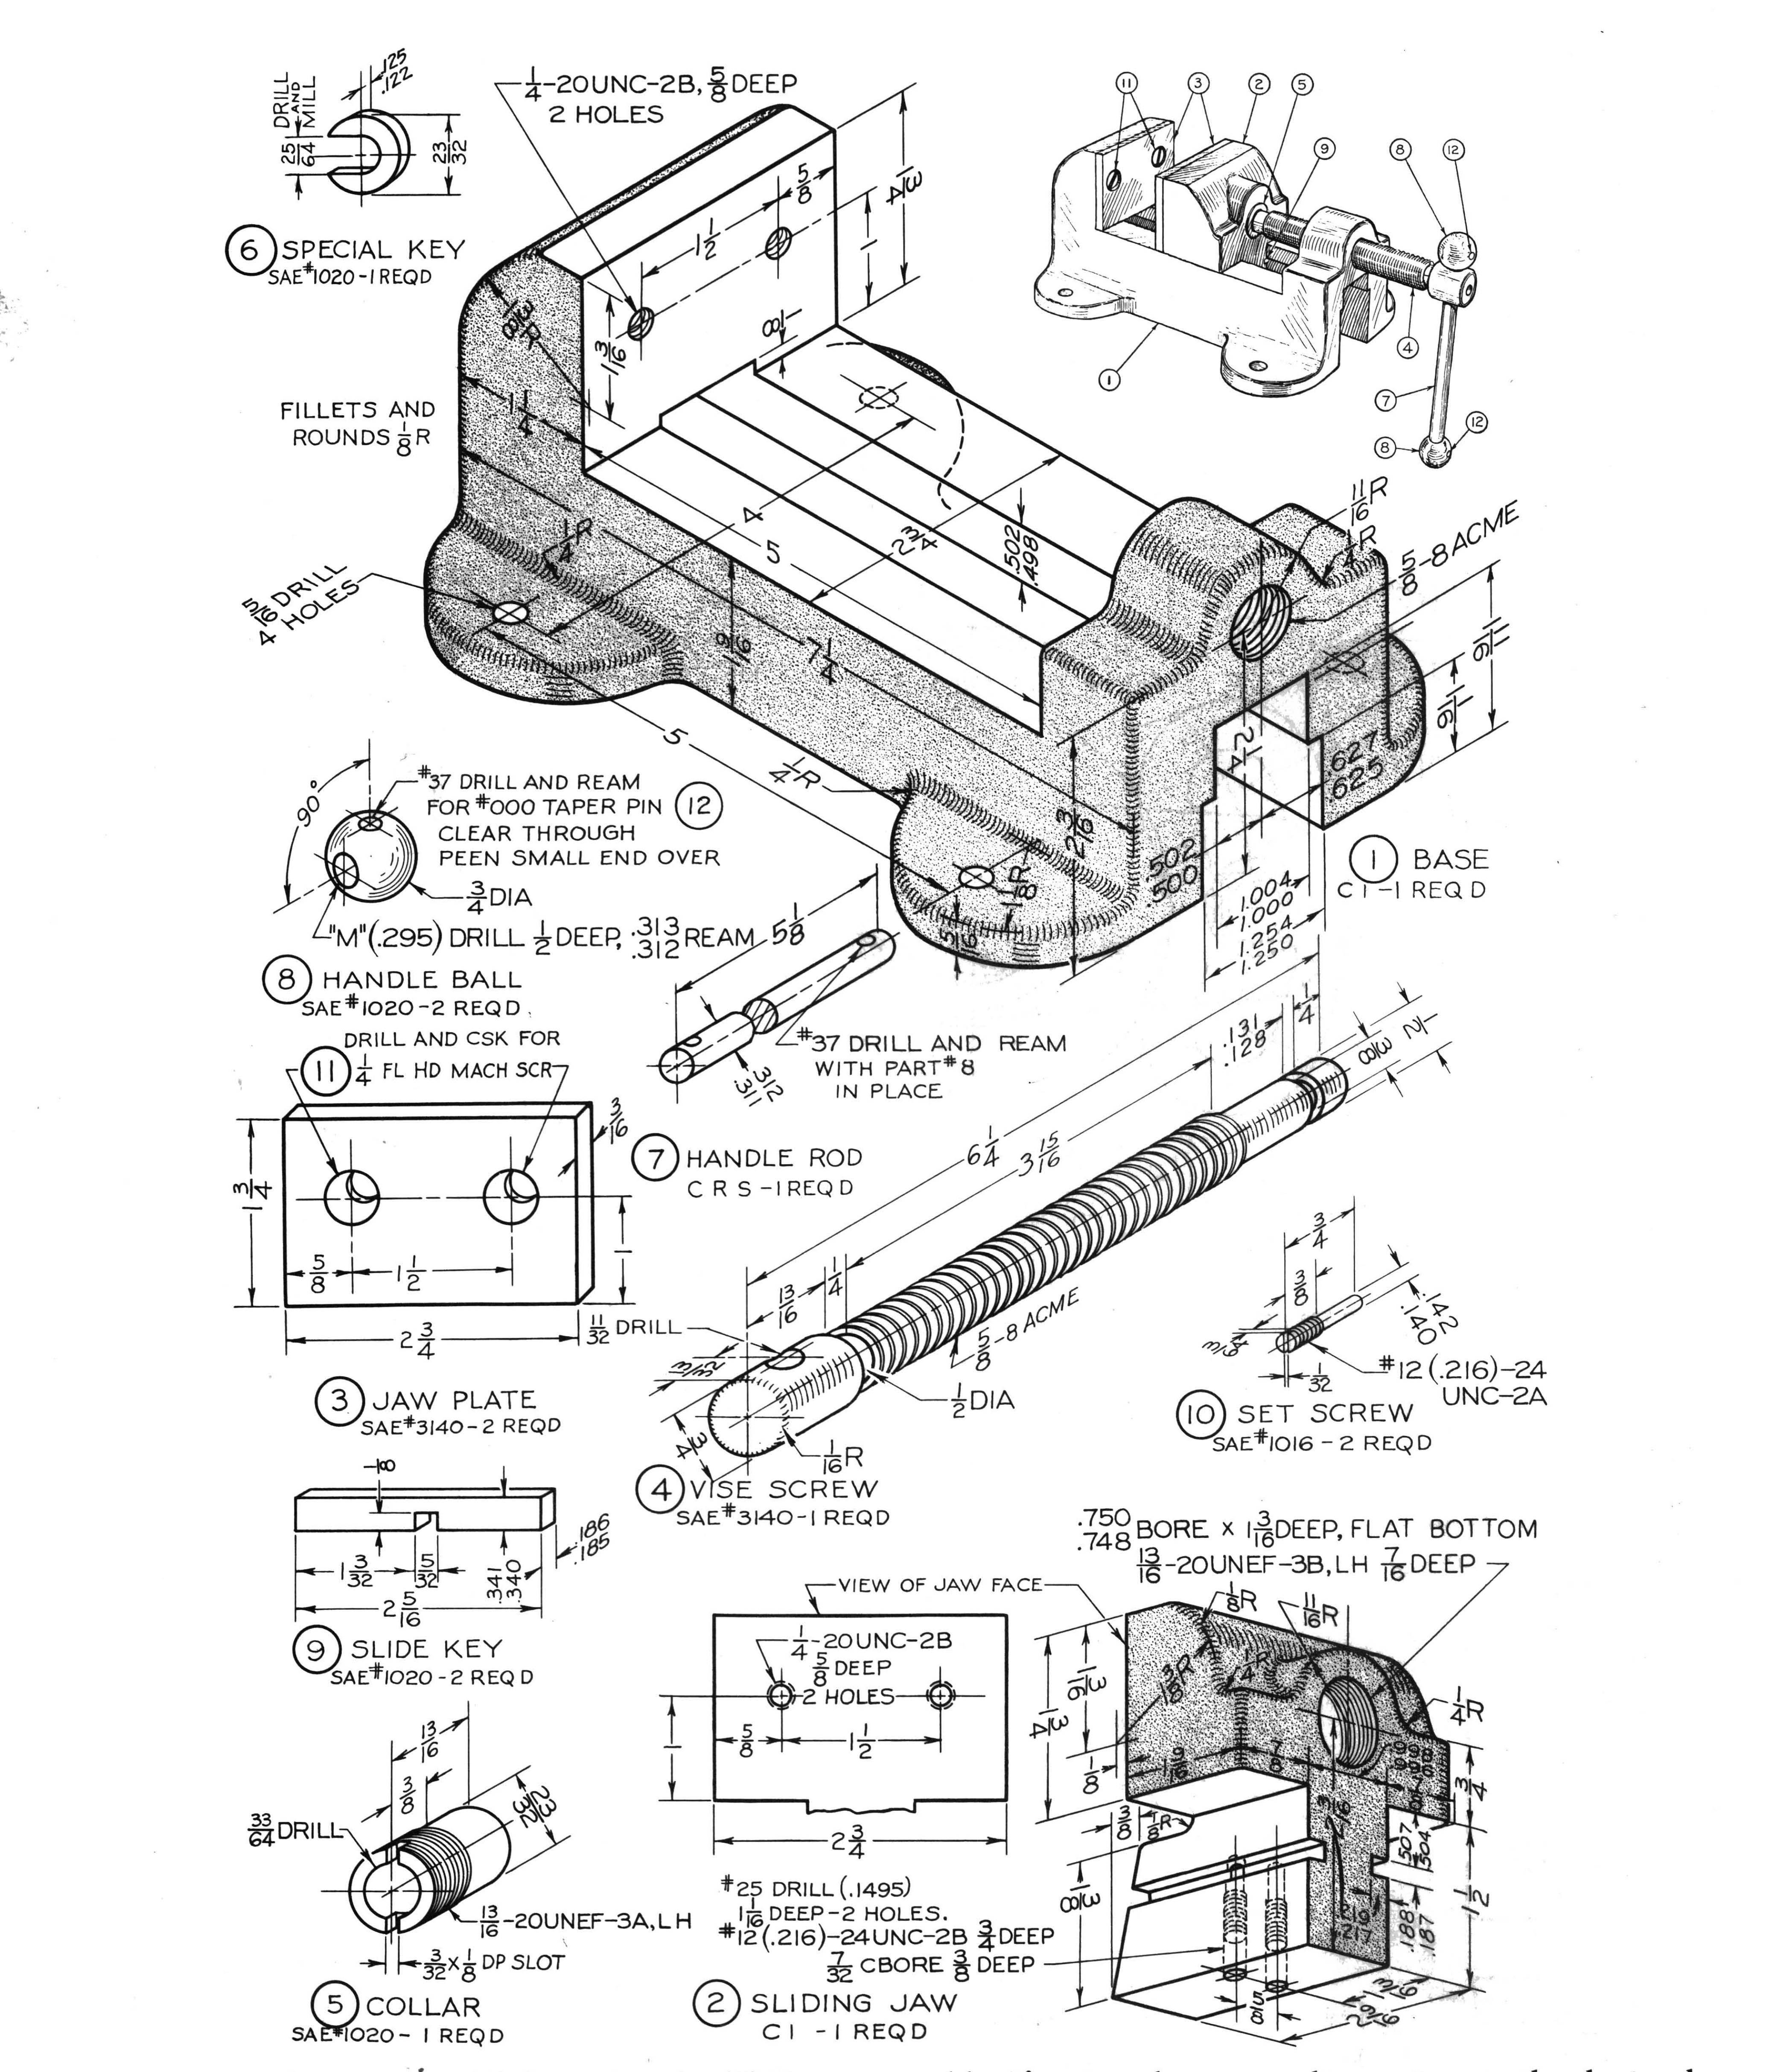 medium resolution of solidworks tutorial 3d cad models engineering works mechanical engineering mechanical design